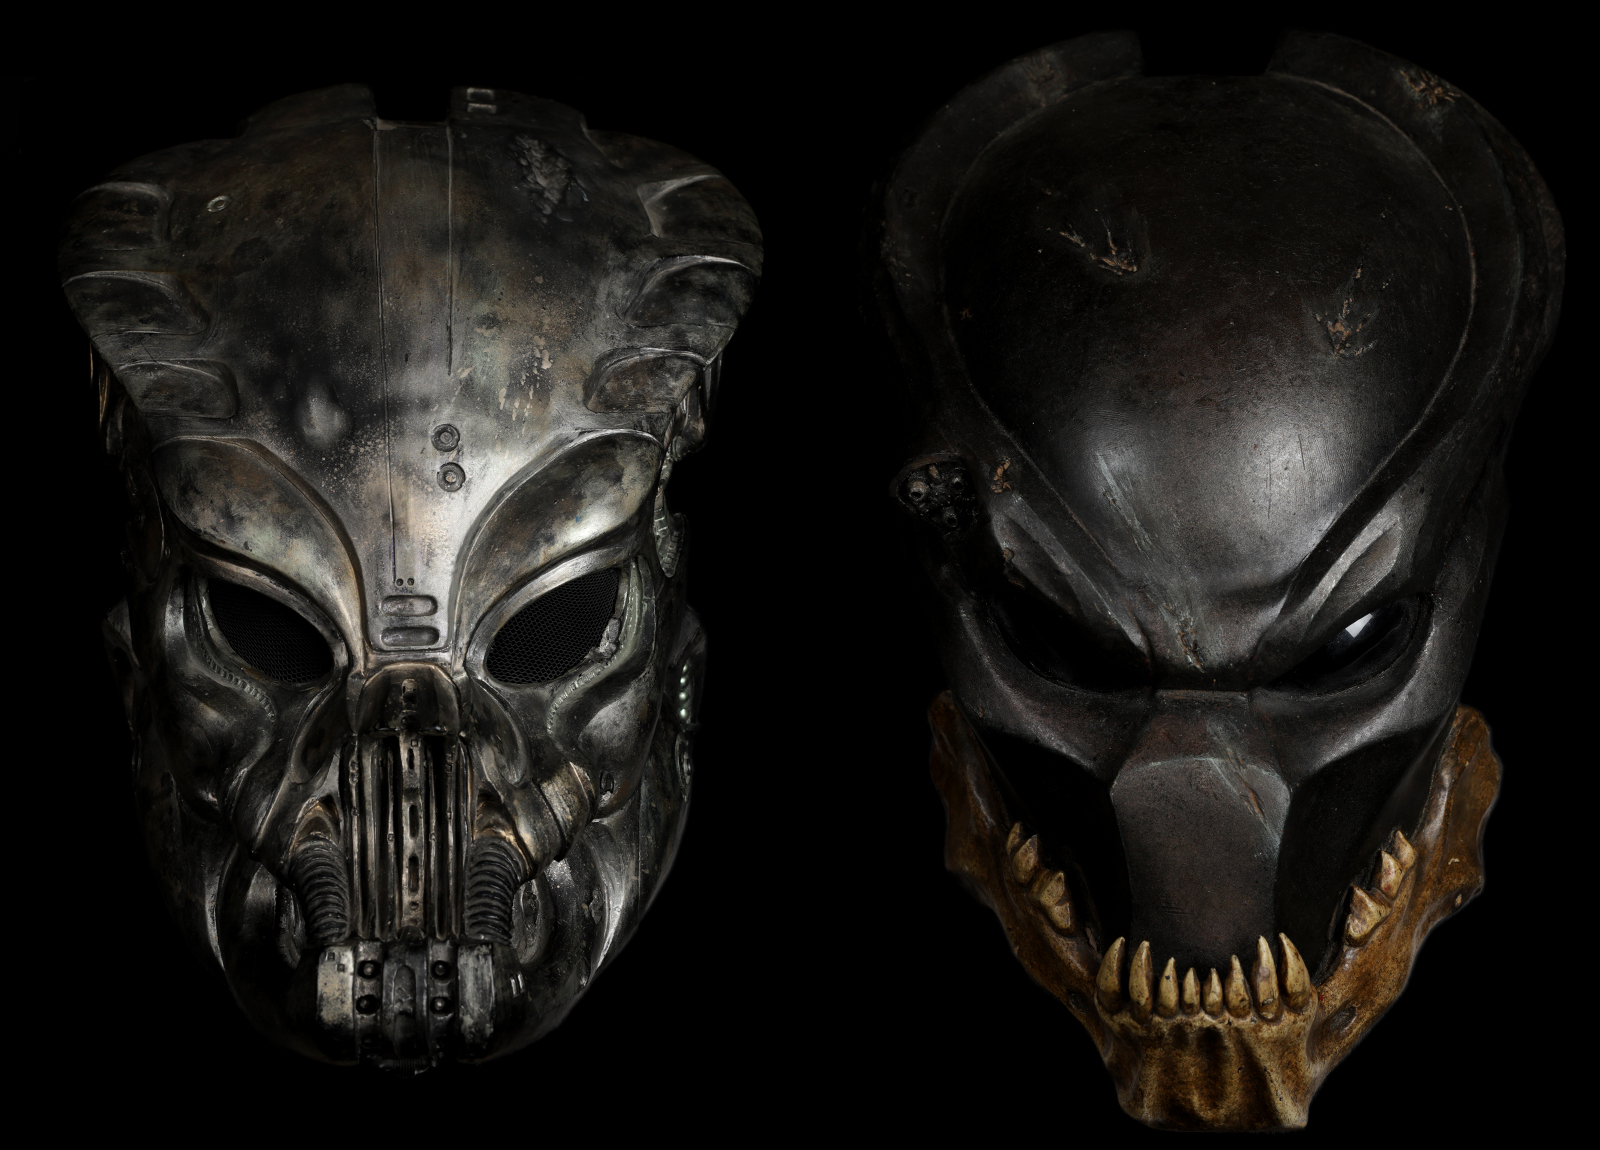 Pedator-bio-mask-helmet-compare-berseker.jpg